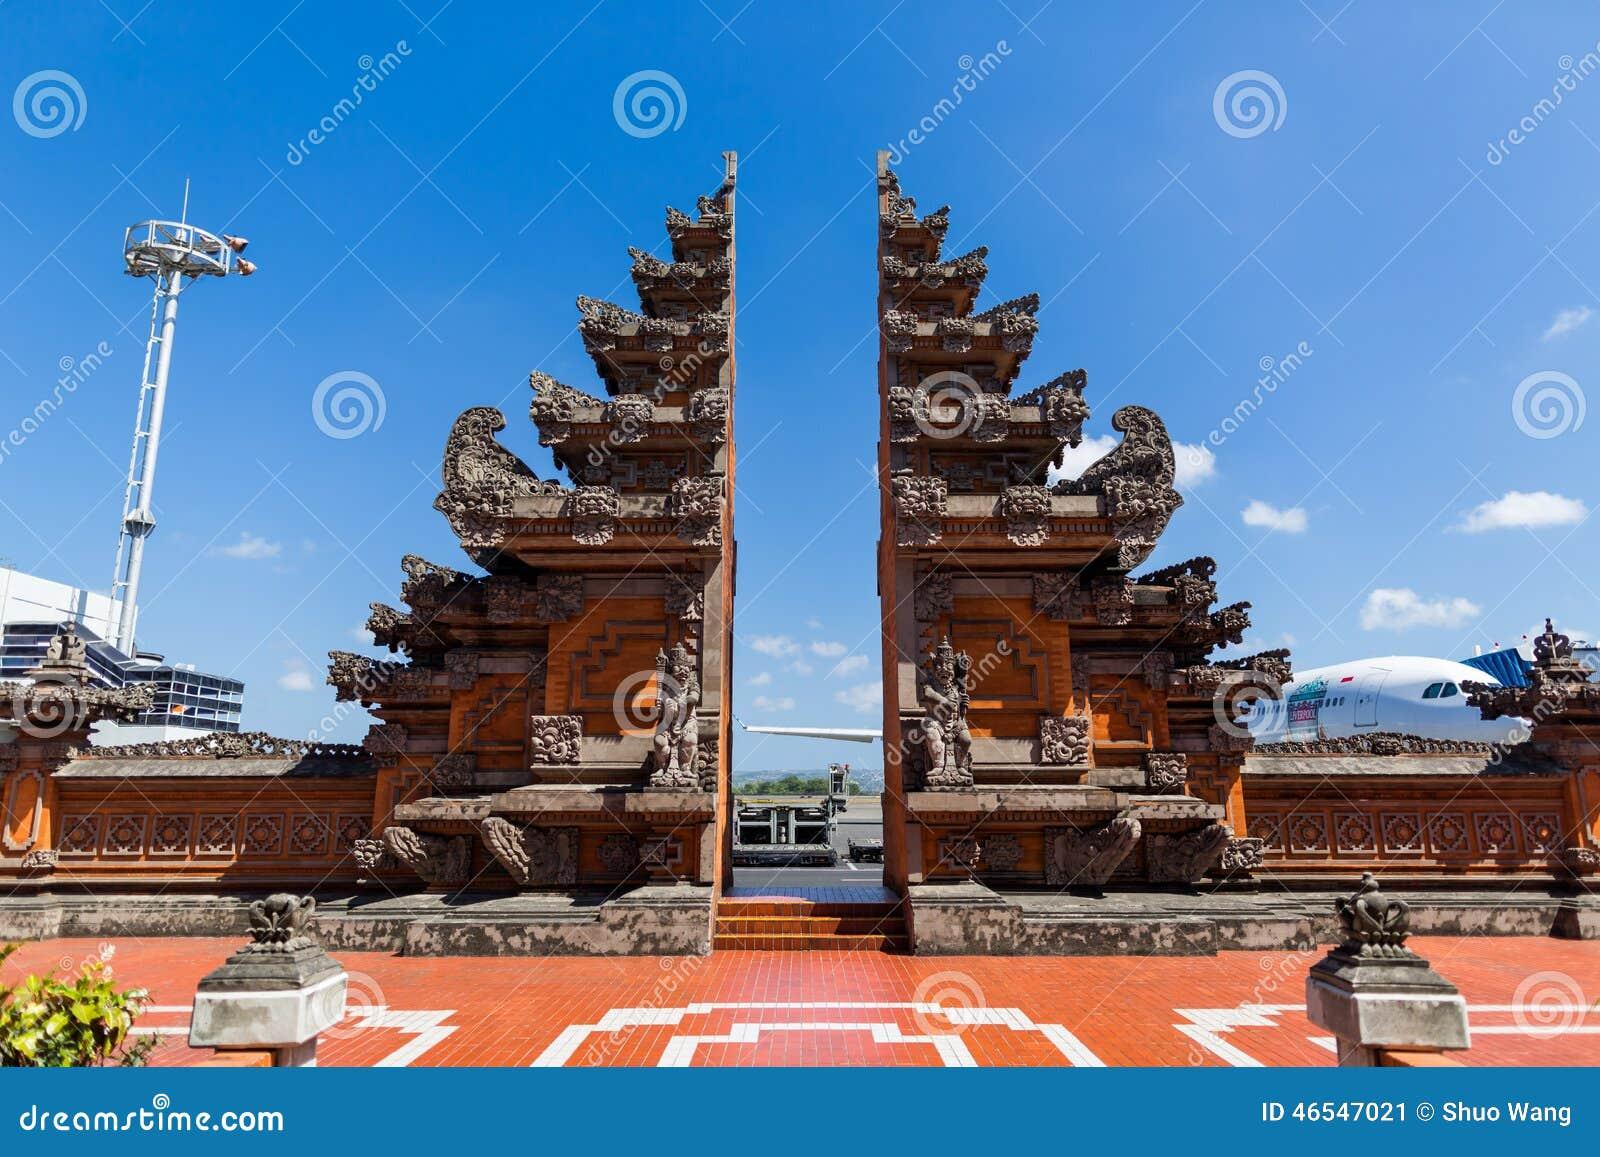 Aeroporto Bali : Bali airport editorial photo image of faith airport